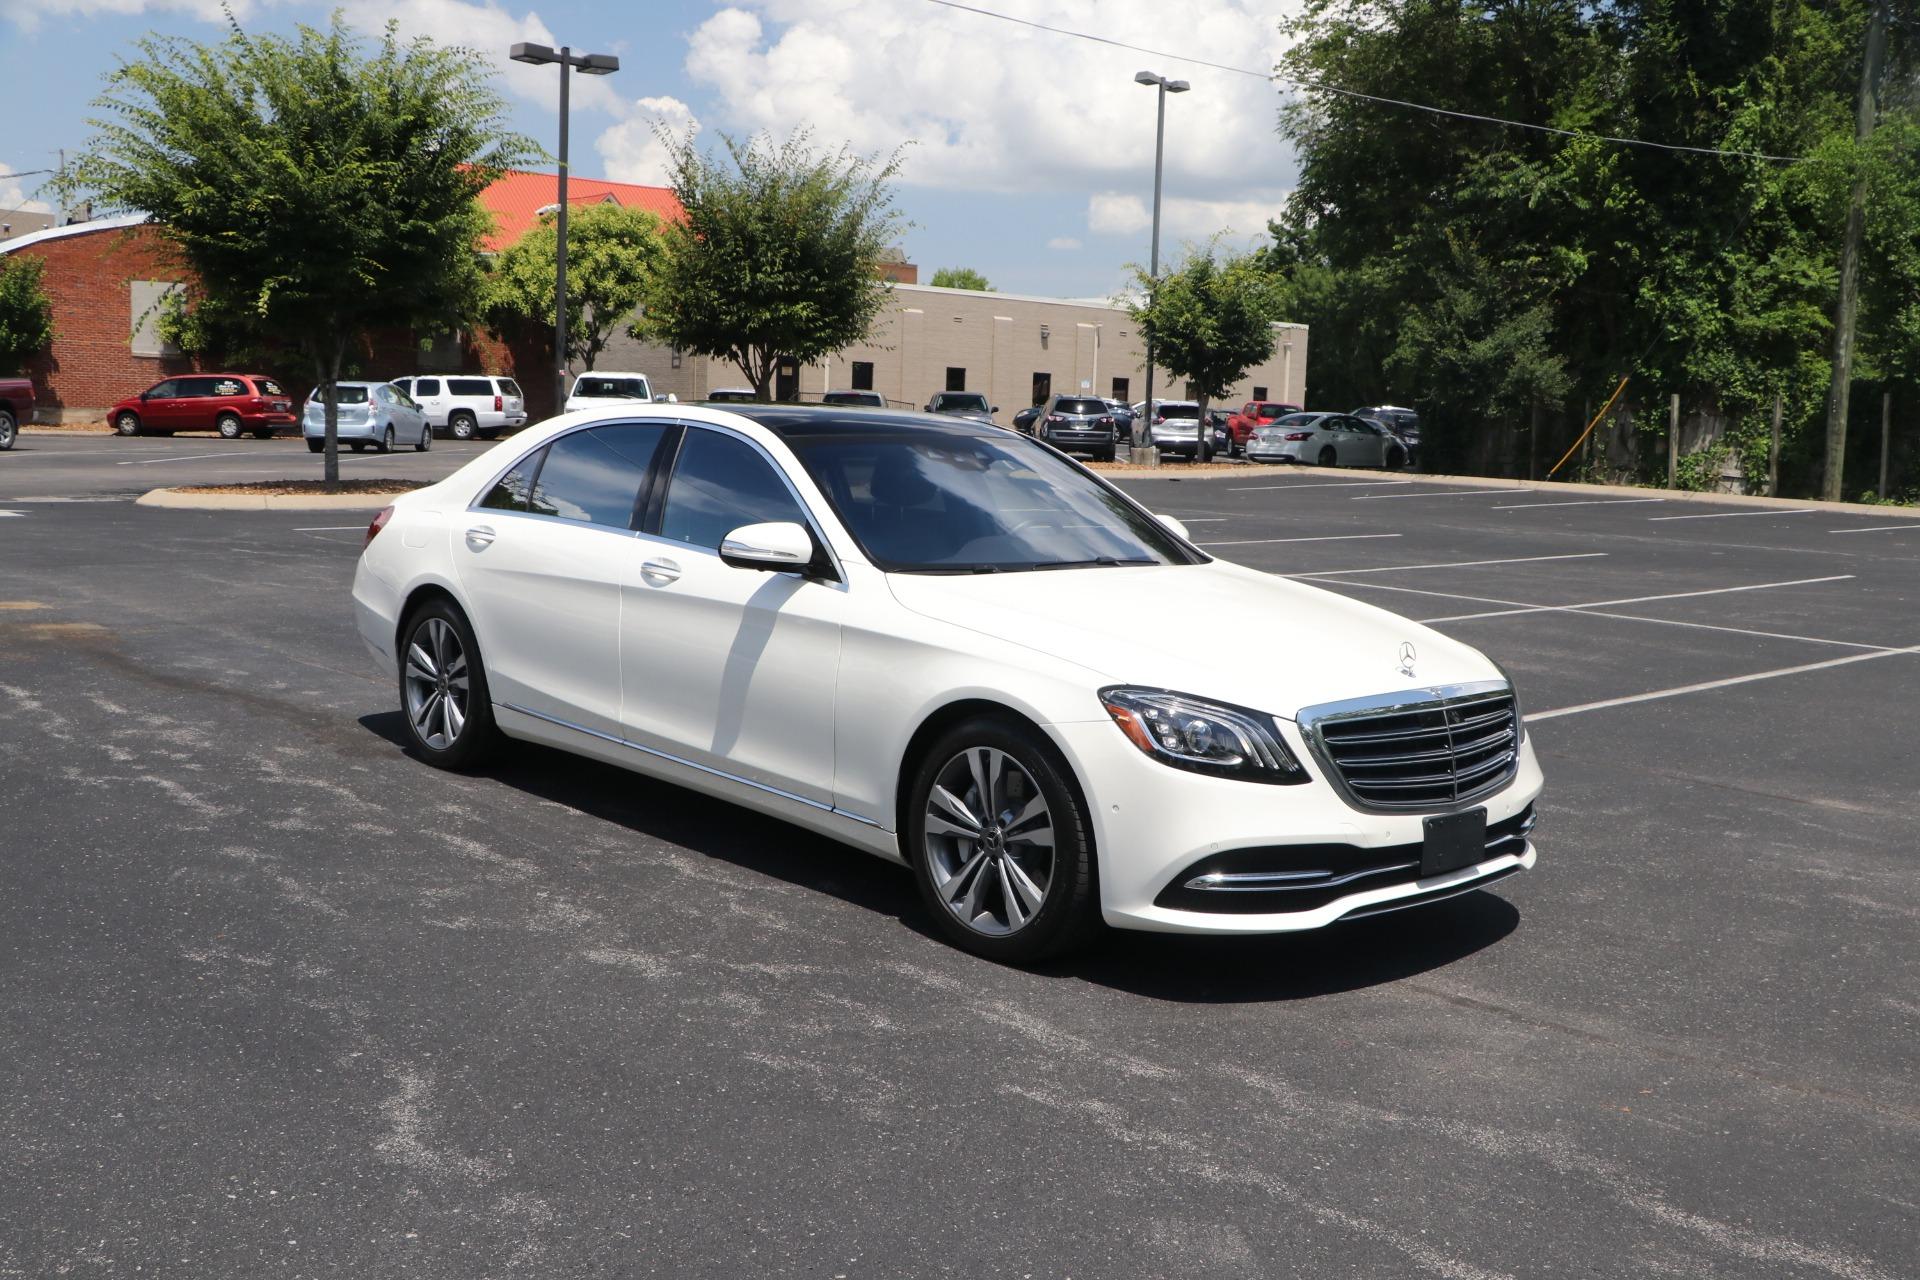 Used 2018 Mercedes-Benz S450 PREMIUM RWD W/NAV for sale $63,500 at Auto Collection in Murfreesboro TN 37130 1